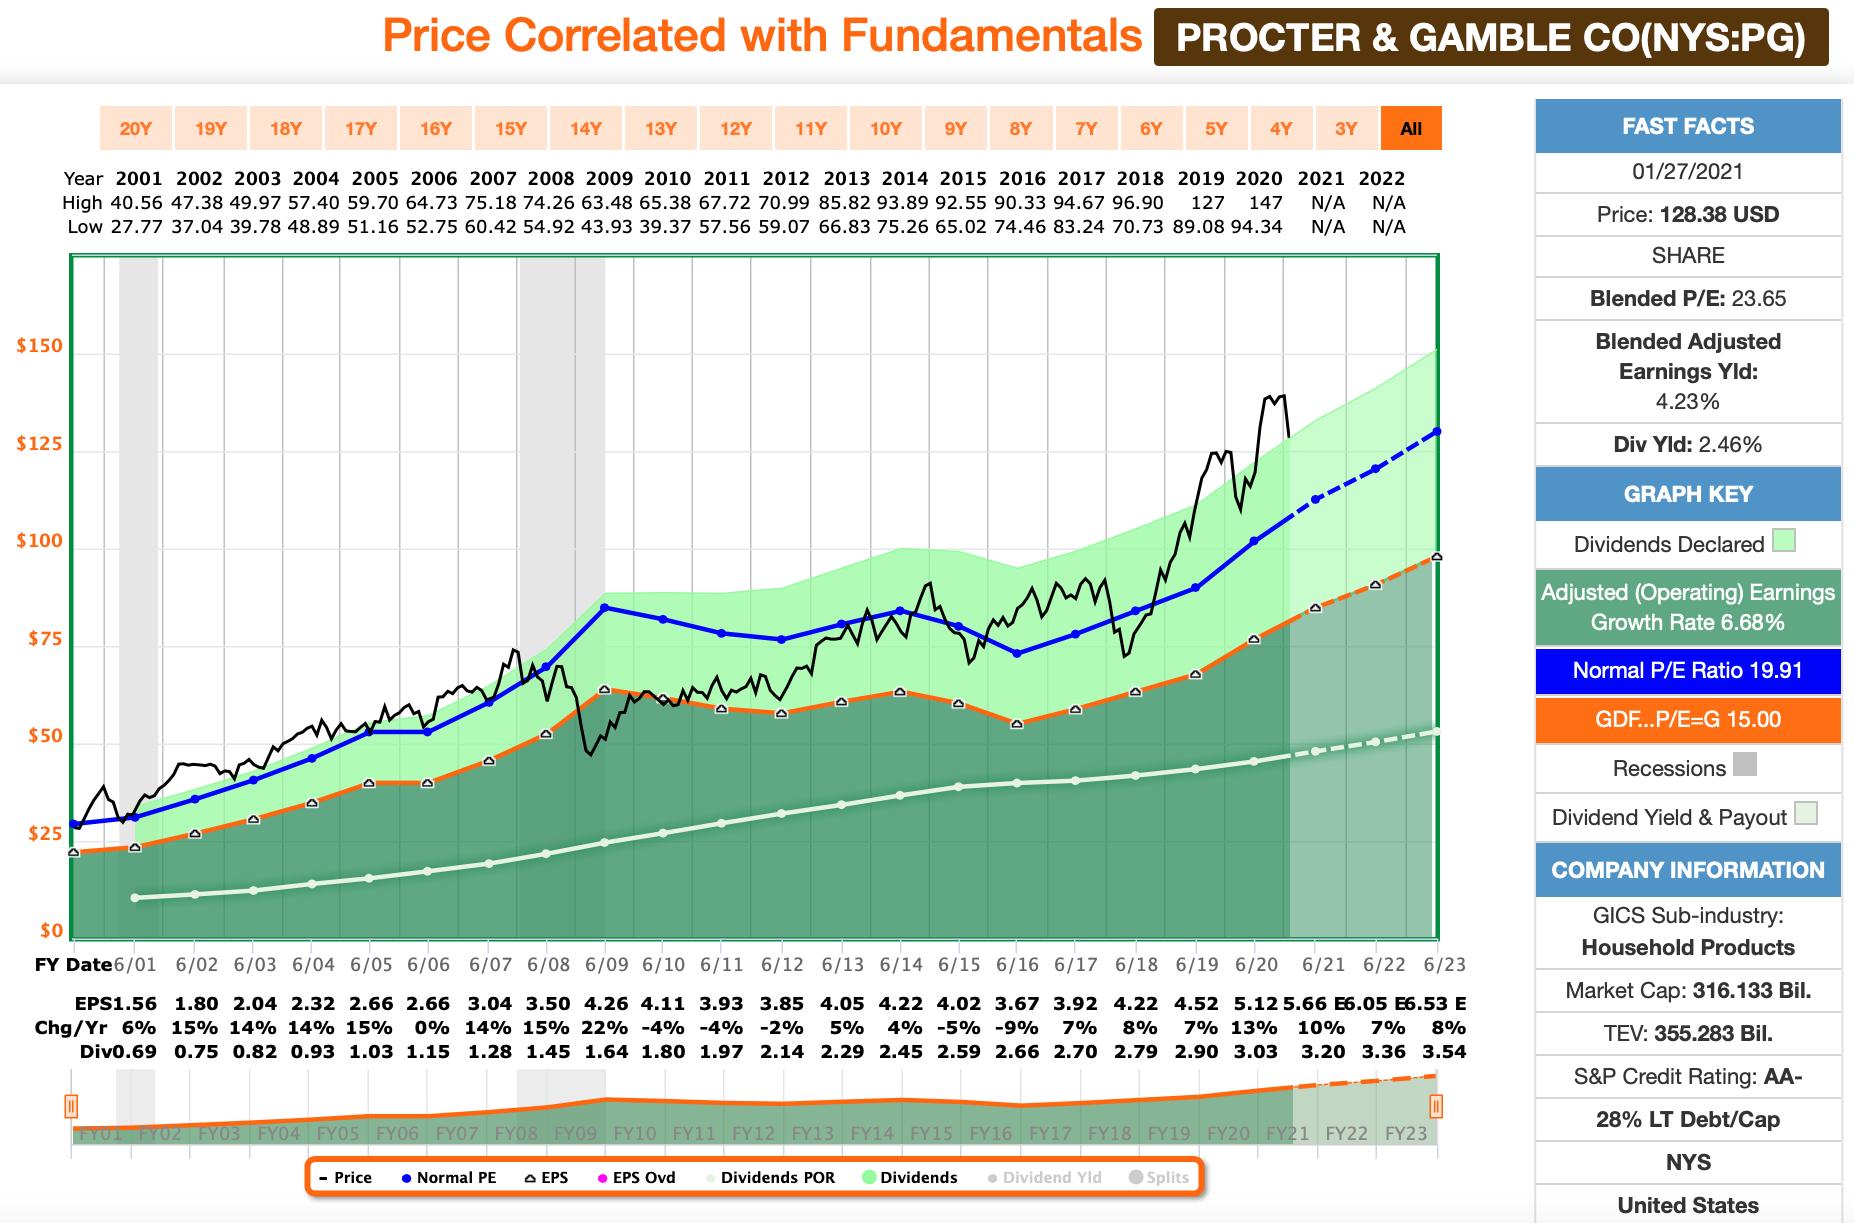 Procter & Gamble FastGraphs